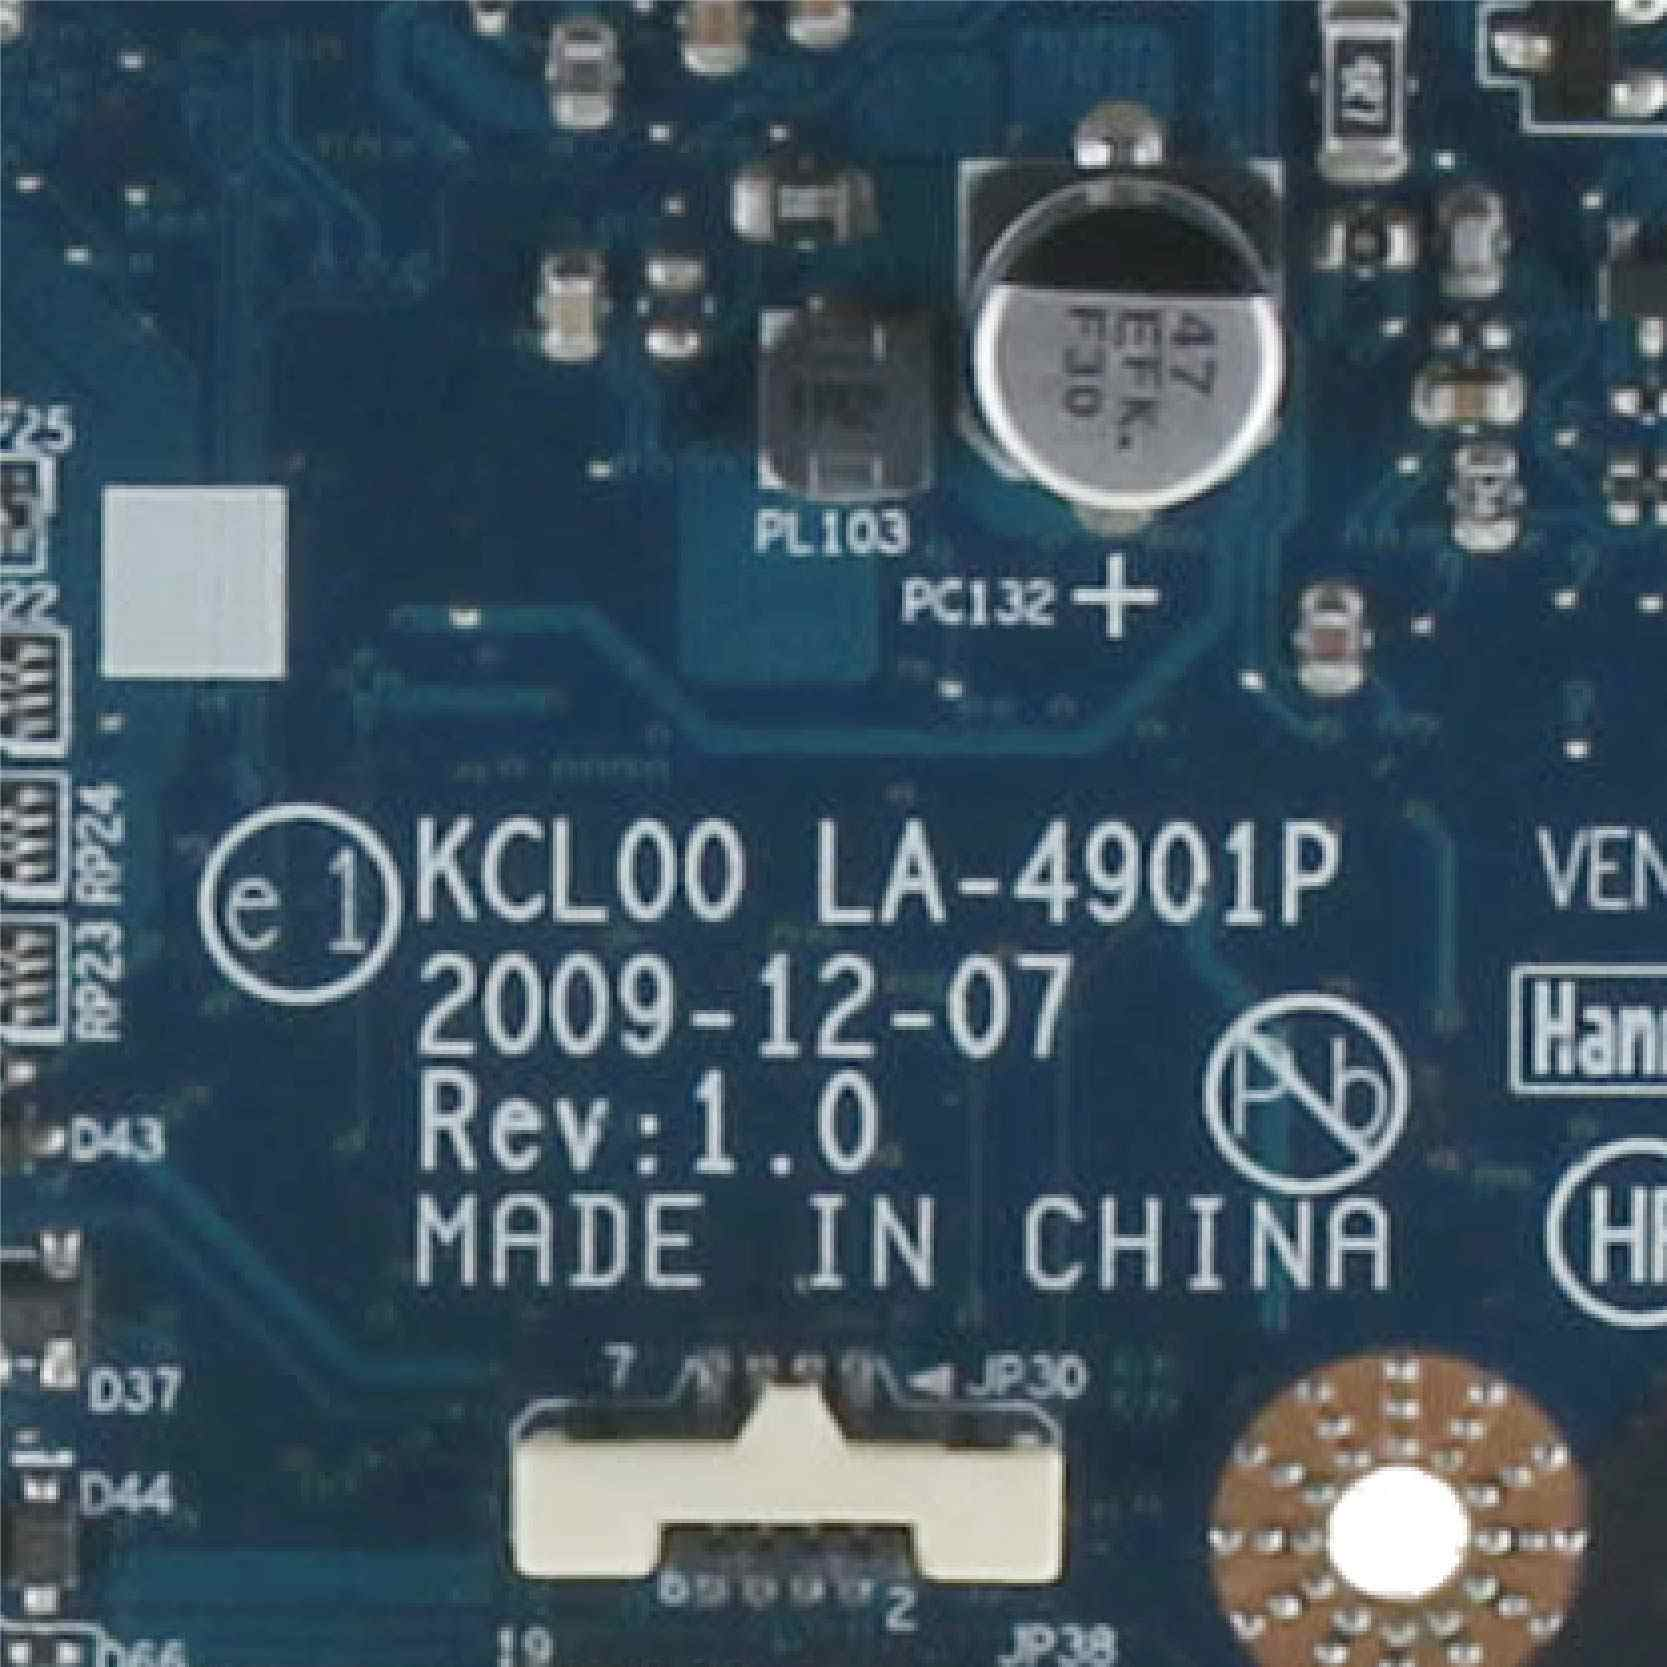 KoCoQin เมนบอร์ดแล็ปท็อปสำหรับ HP EliteBook 8440W 8440P QM57 Mainboard 594026-001 594026-501 KCL00 LA-4901P n10M-NS-S-B1 QM57